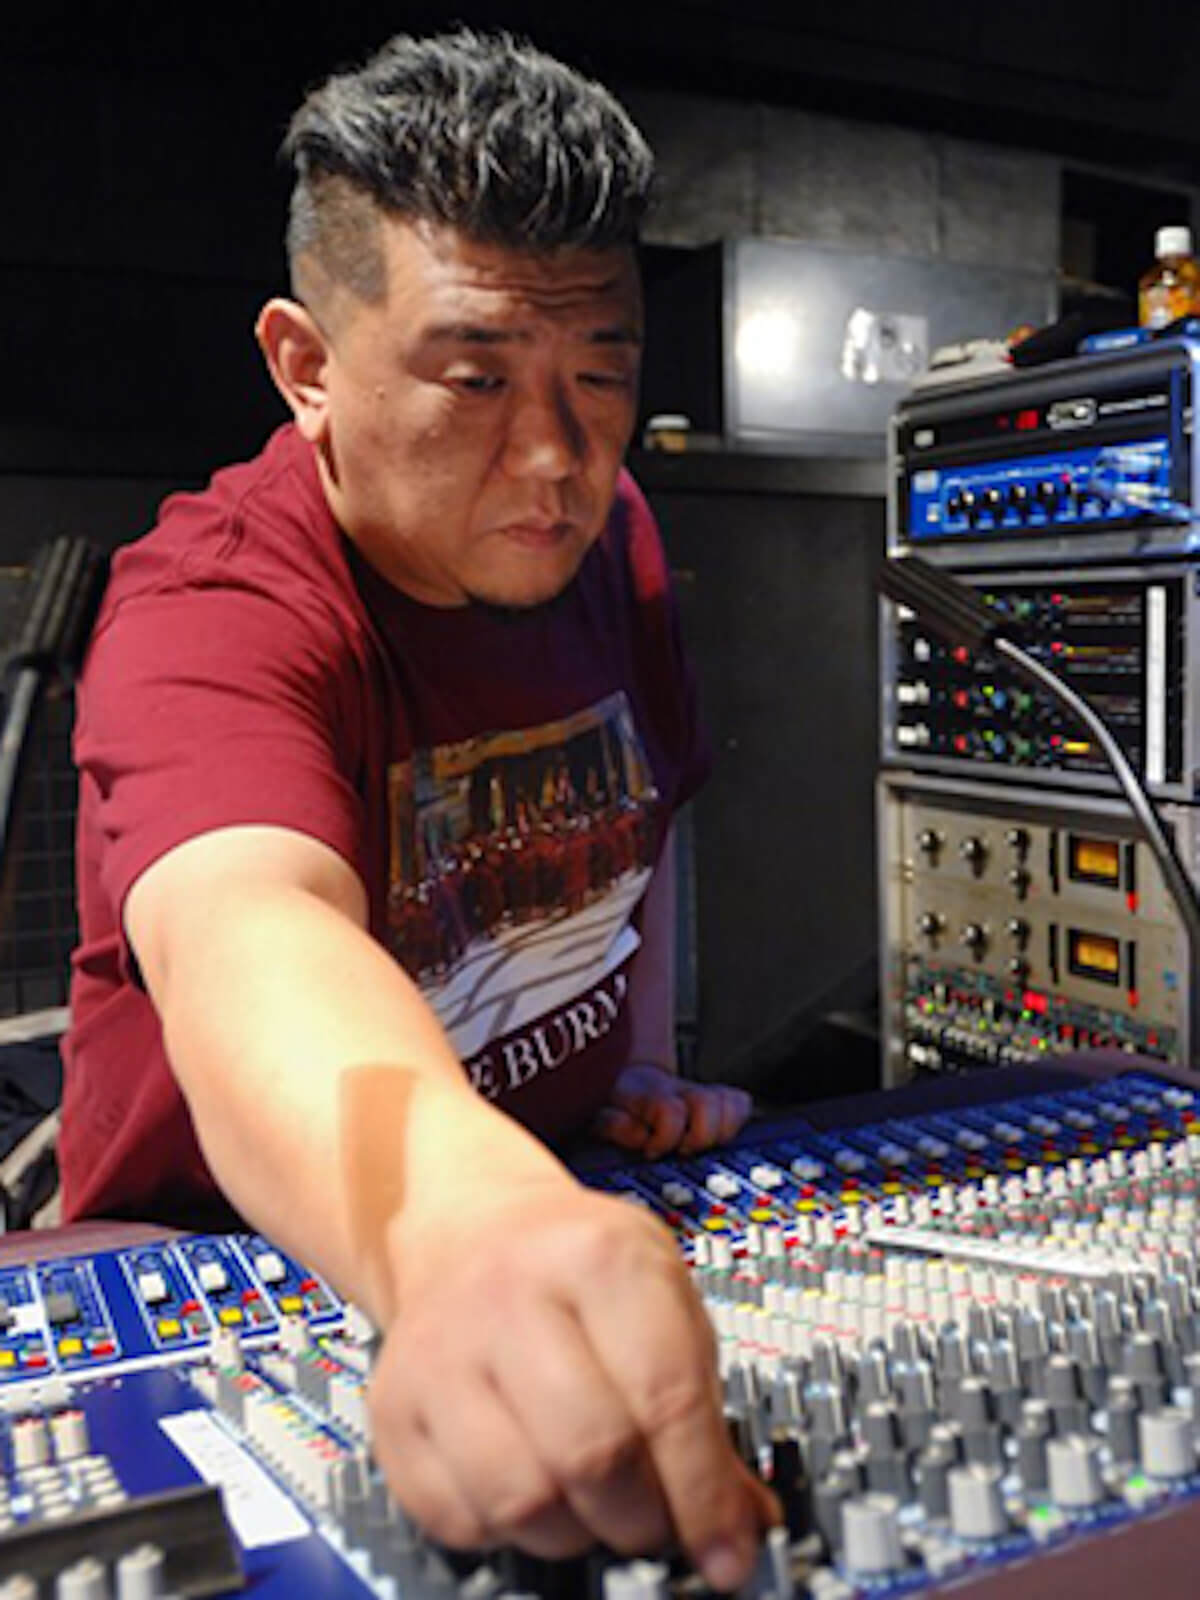 SL−1200MK7発売記念、DOMMUNEにてスペシャル番組配信決定 DJ KOCO A.K.A SHIMOKITA 、Mighty Crown、MUROら出演 lifefashion190603technics-dommune_DUB-MASTER-X